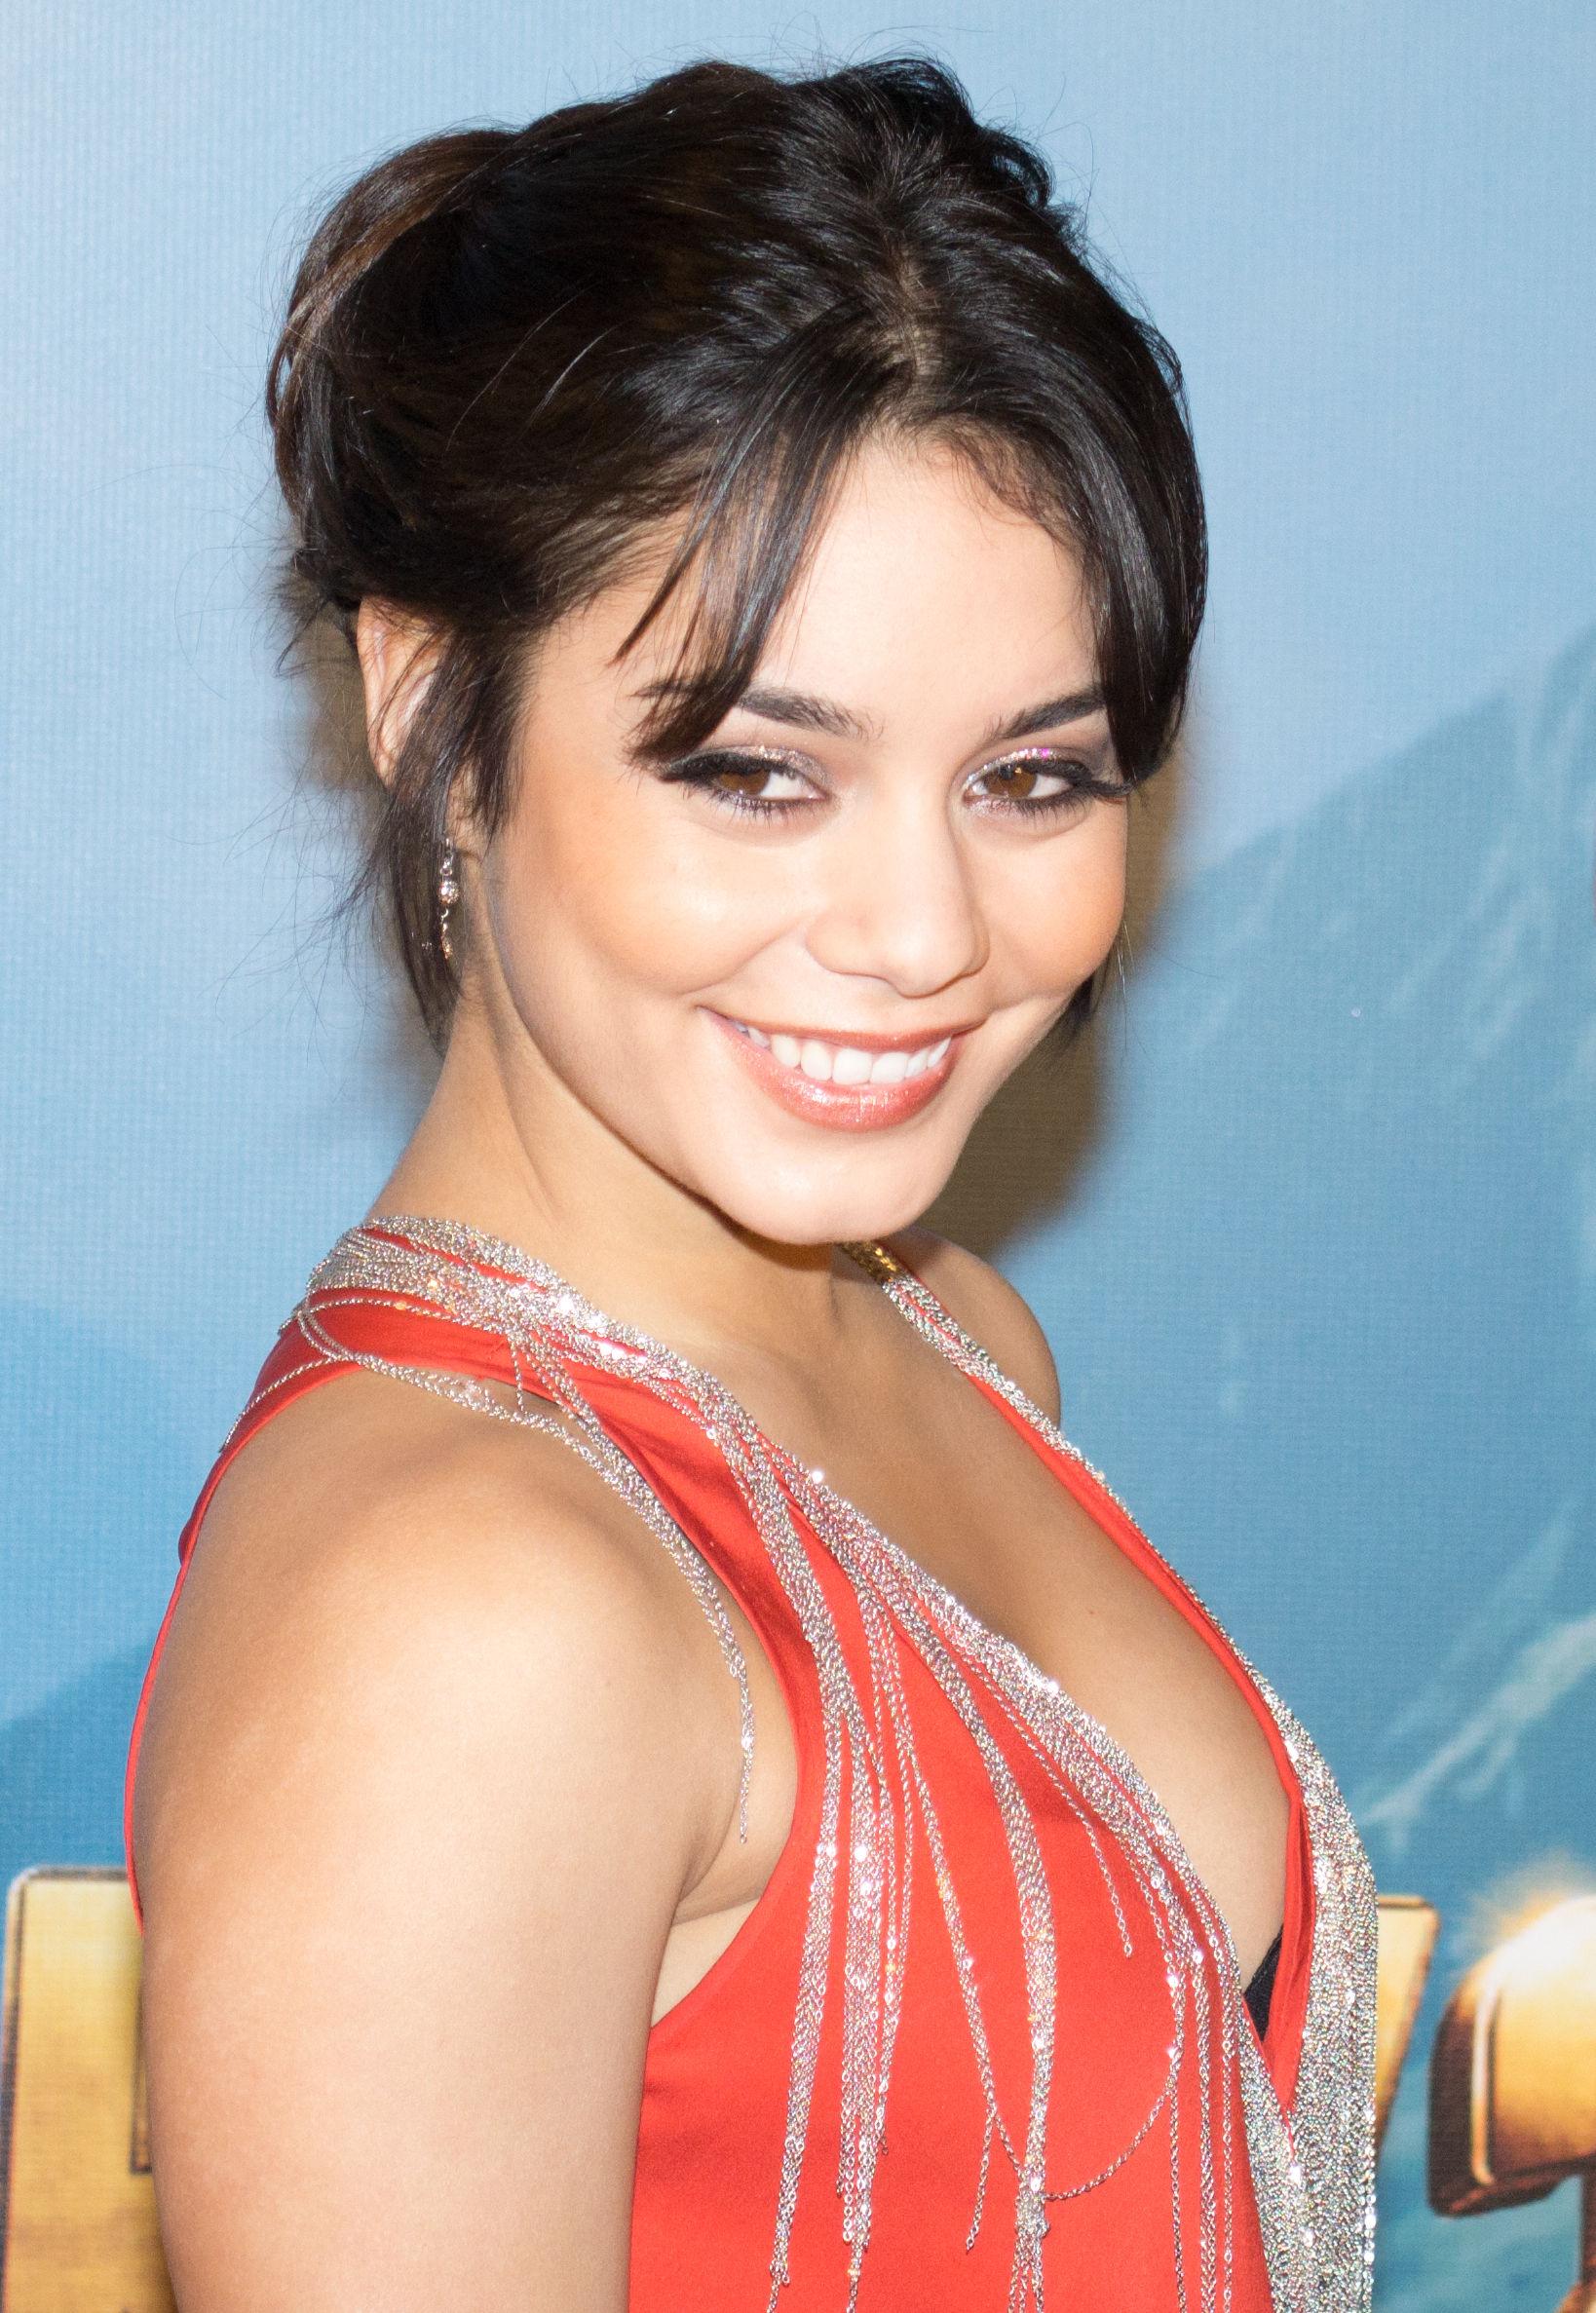 Photo of Vanessa Hudgens: Argentina actress